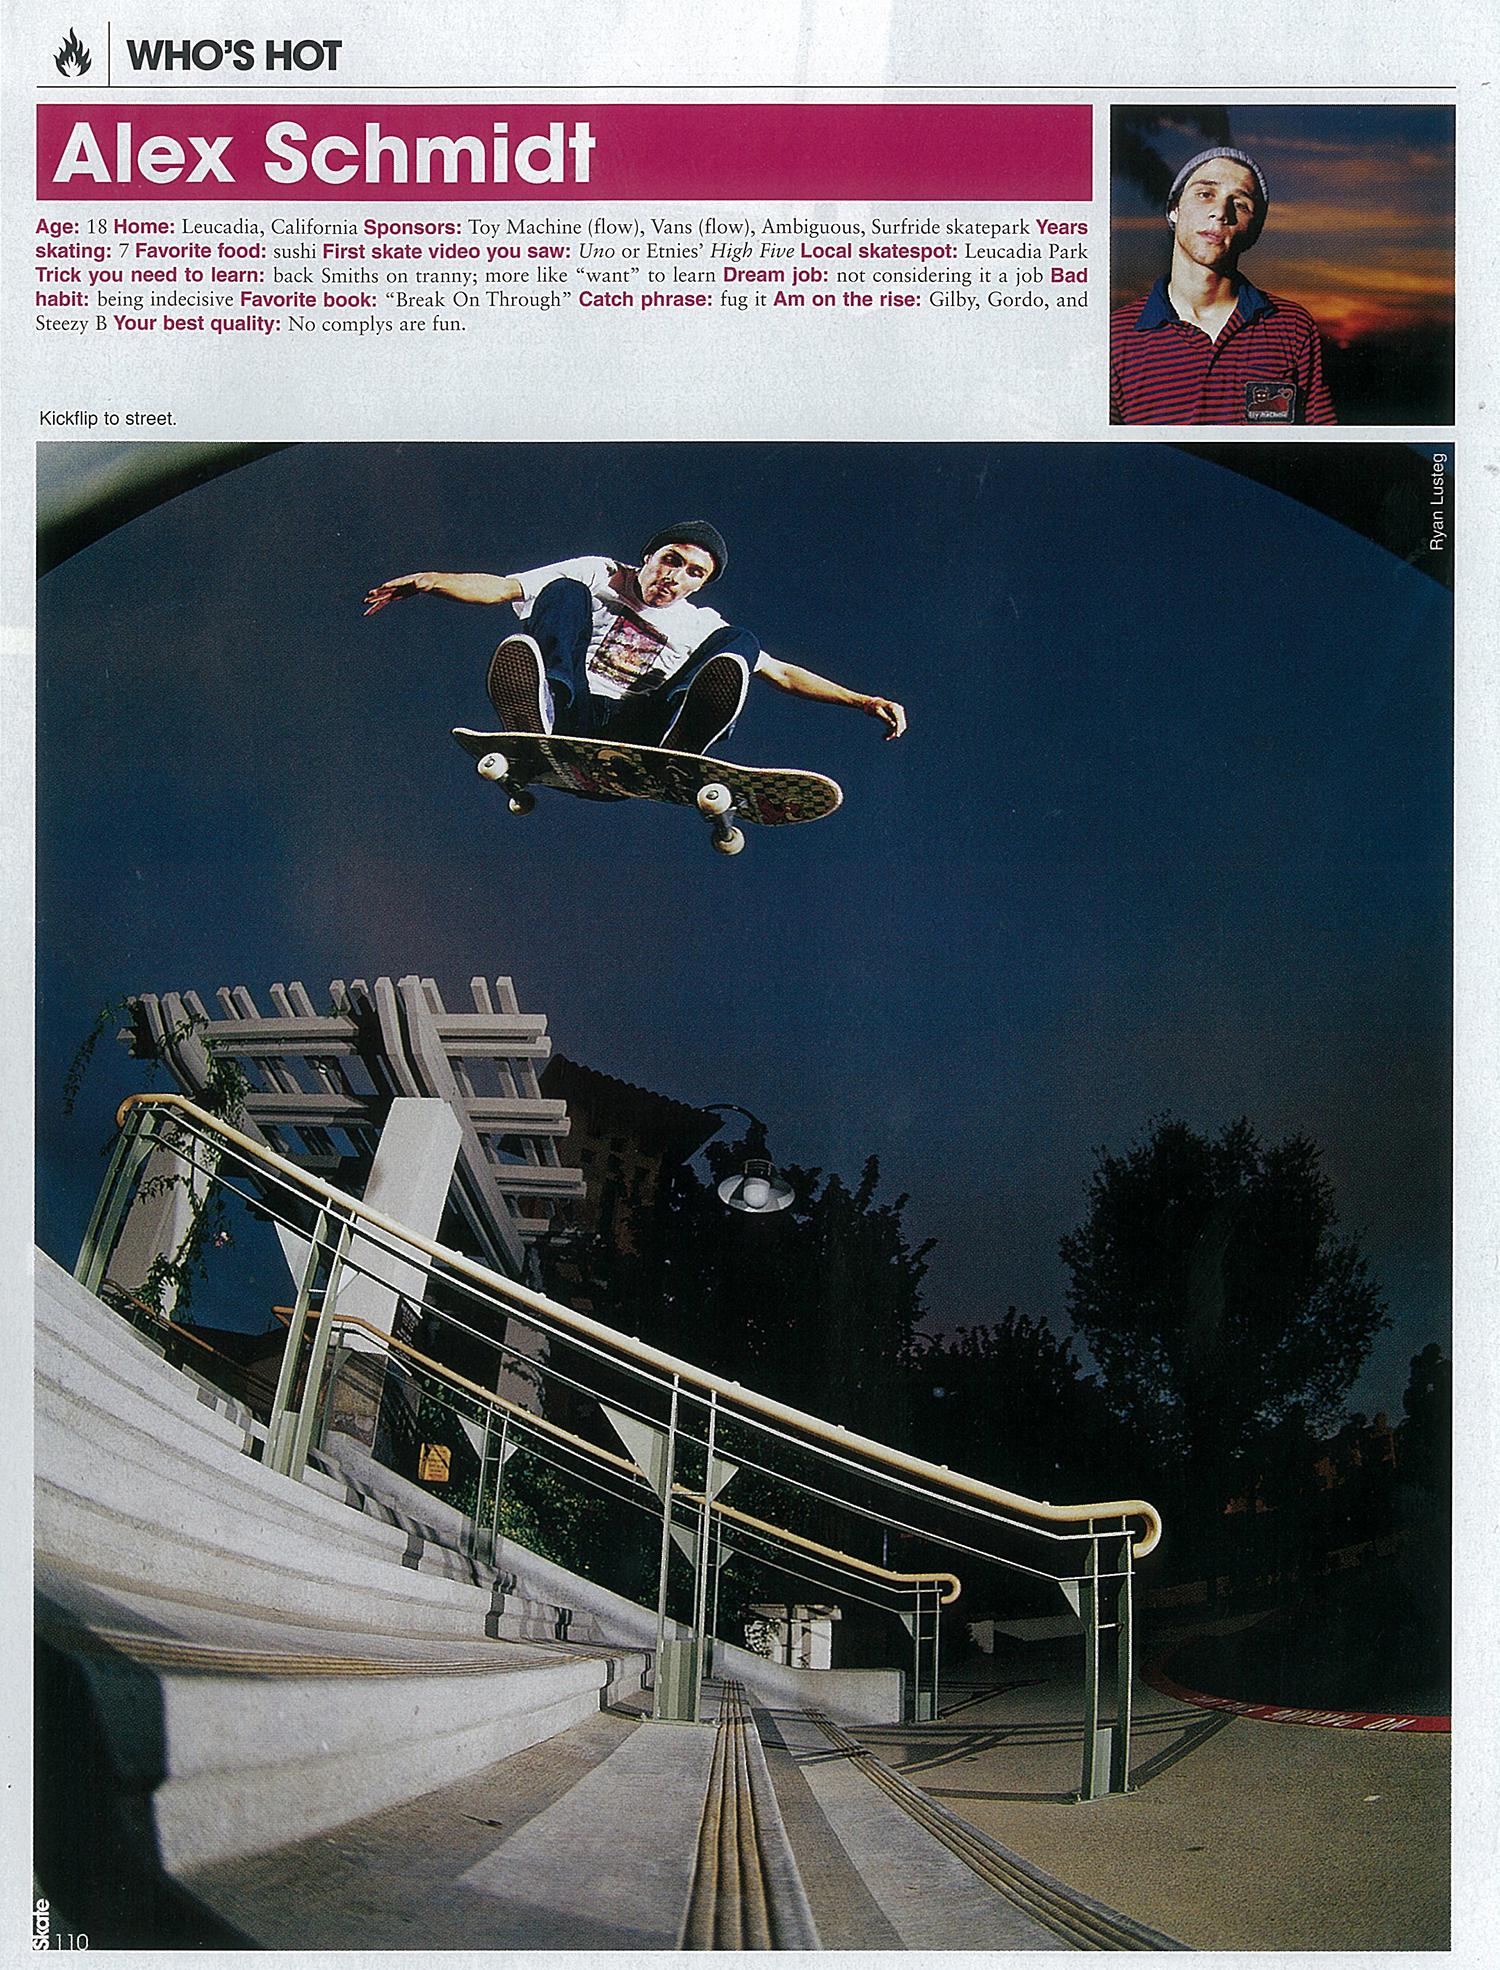 15_alex_schmidt_whos_hot_skateboarder.jpg